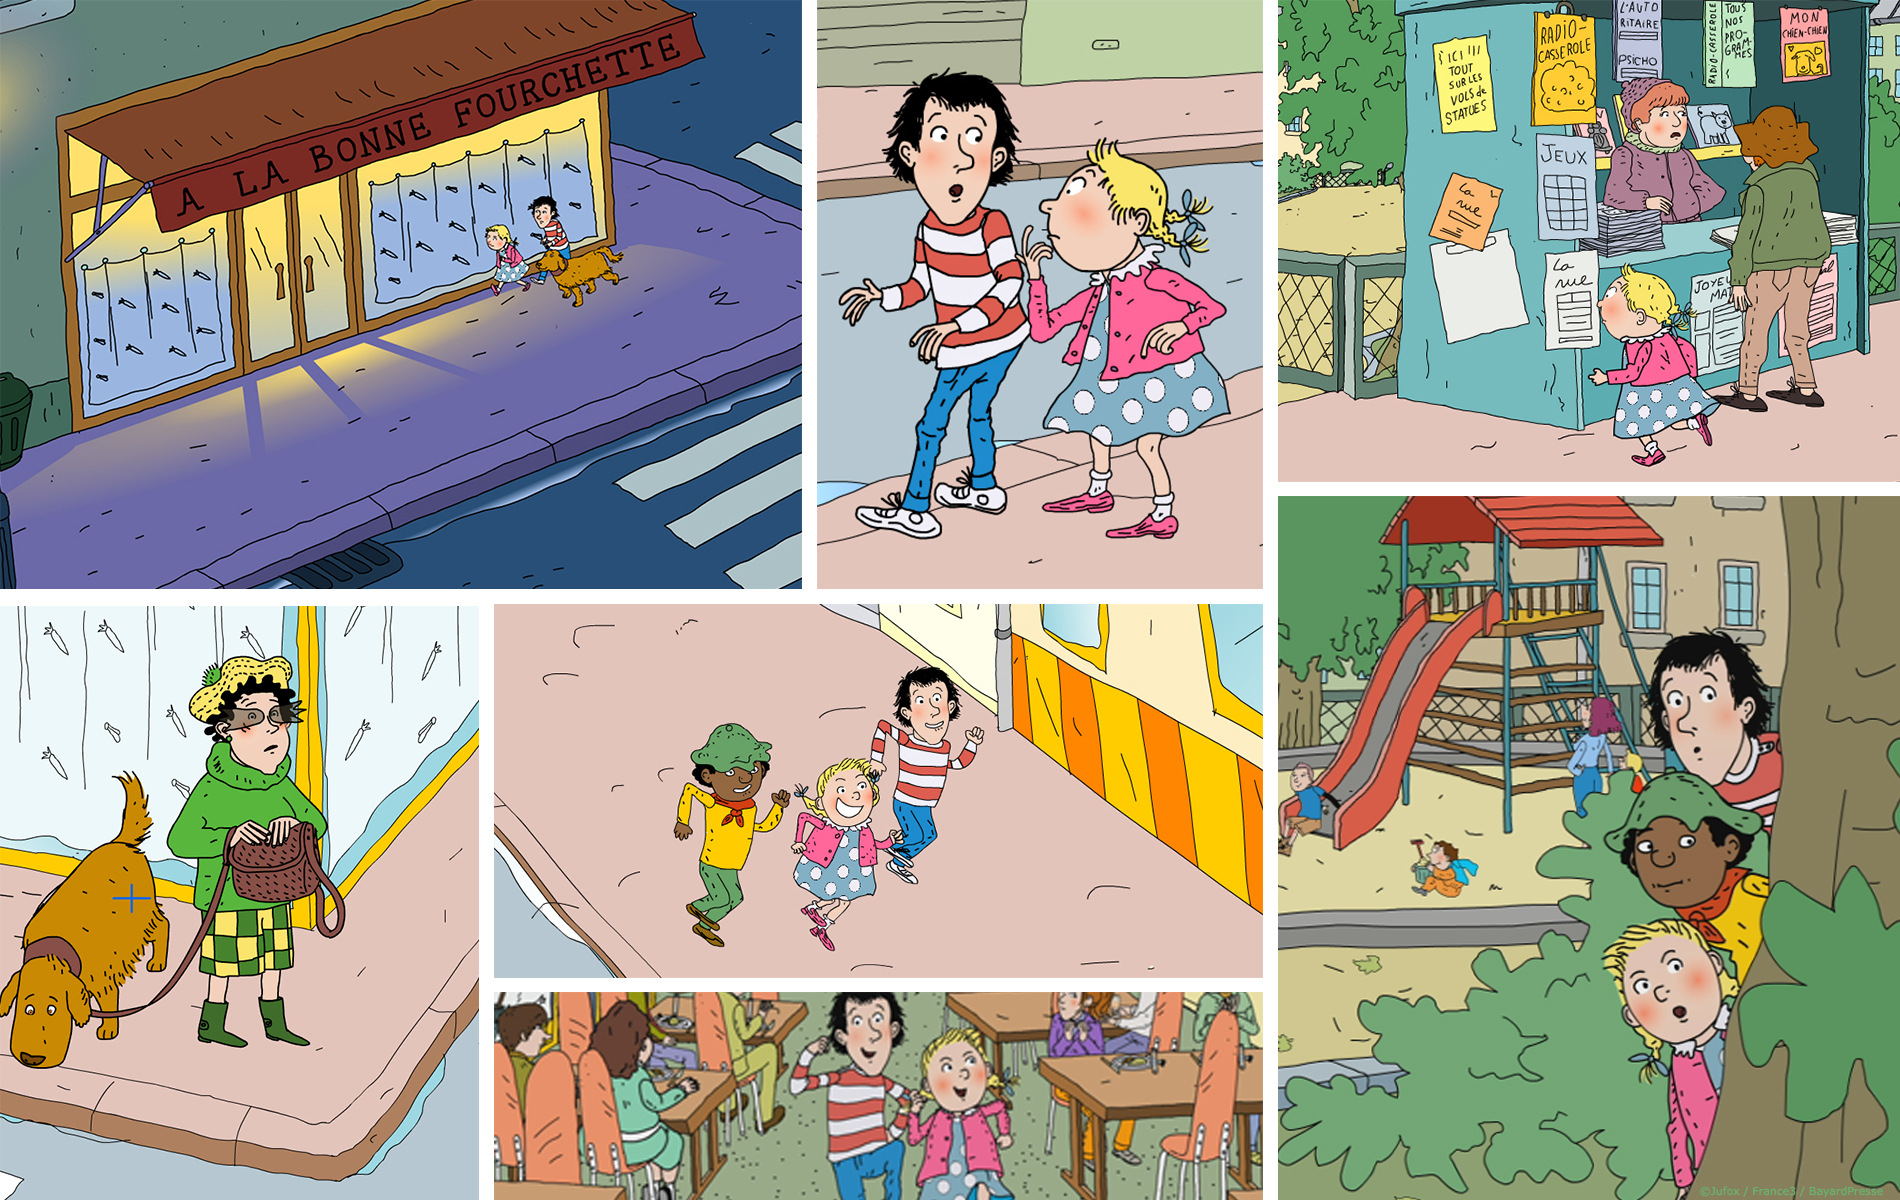 Tom-Tom & Nana - Dessin animée 2D - Studio d animation 2 minutes